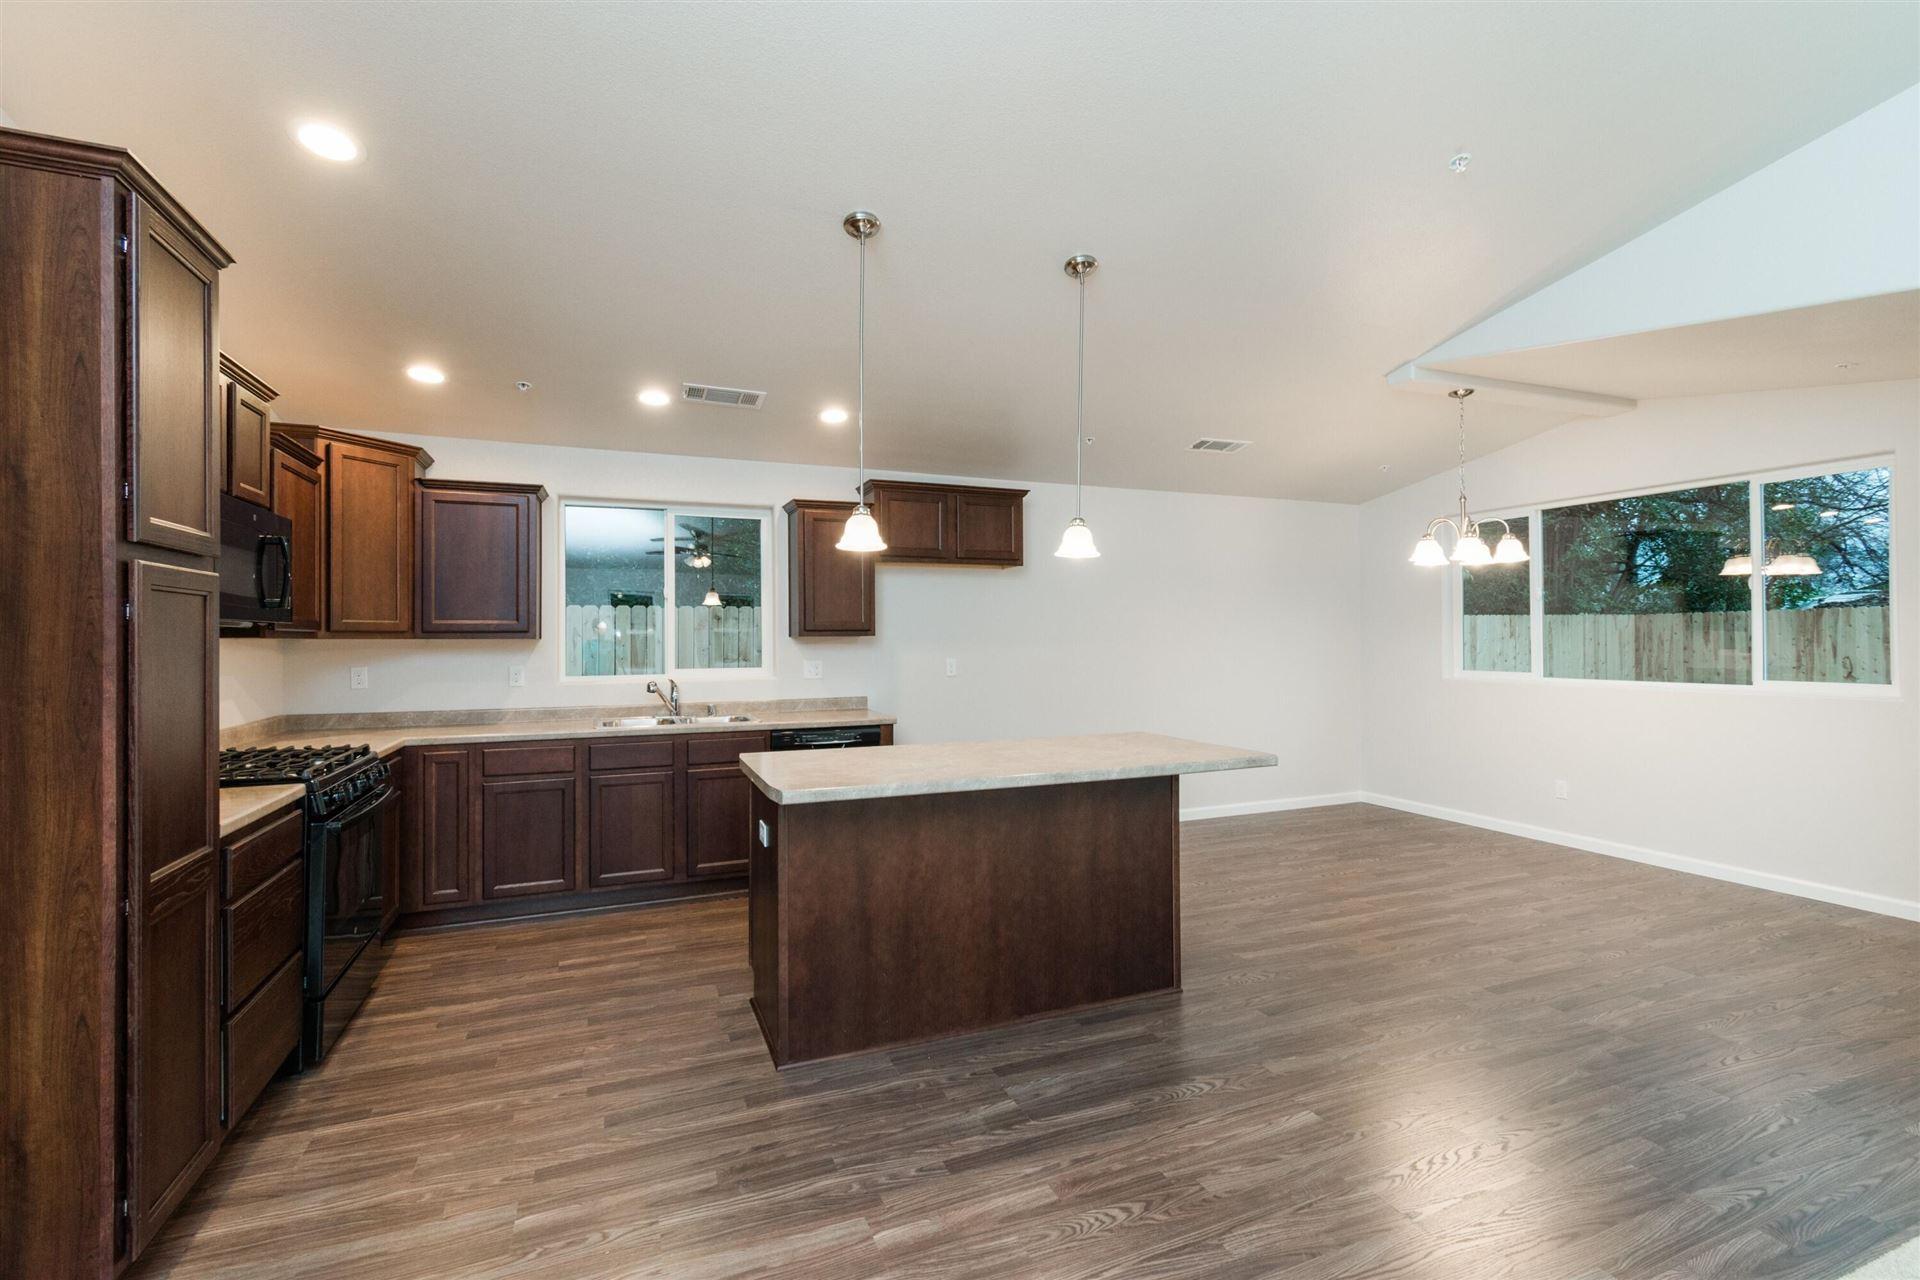 Photo of 1740 Ashby Rd, Shasta Lake, CA 96019 (MLS # 21-3384)